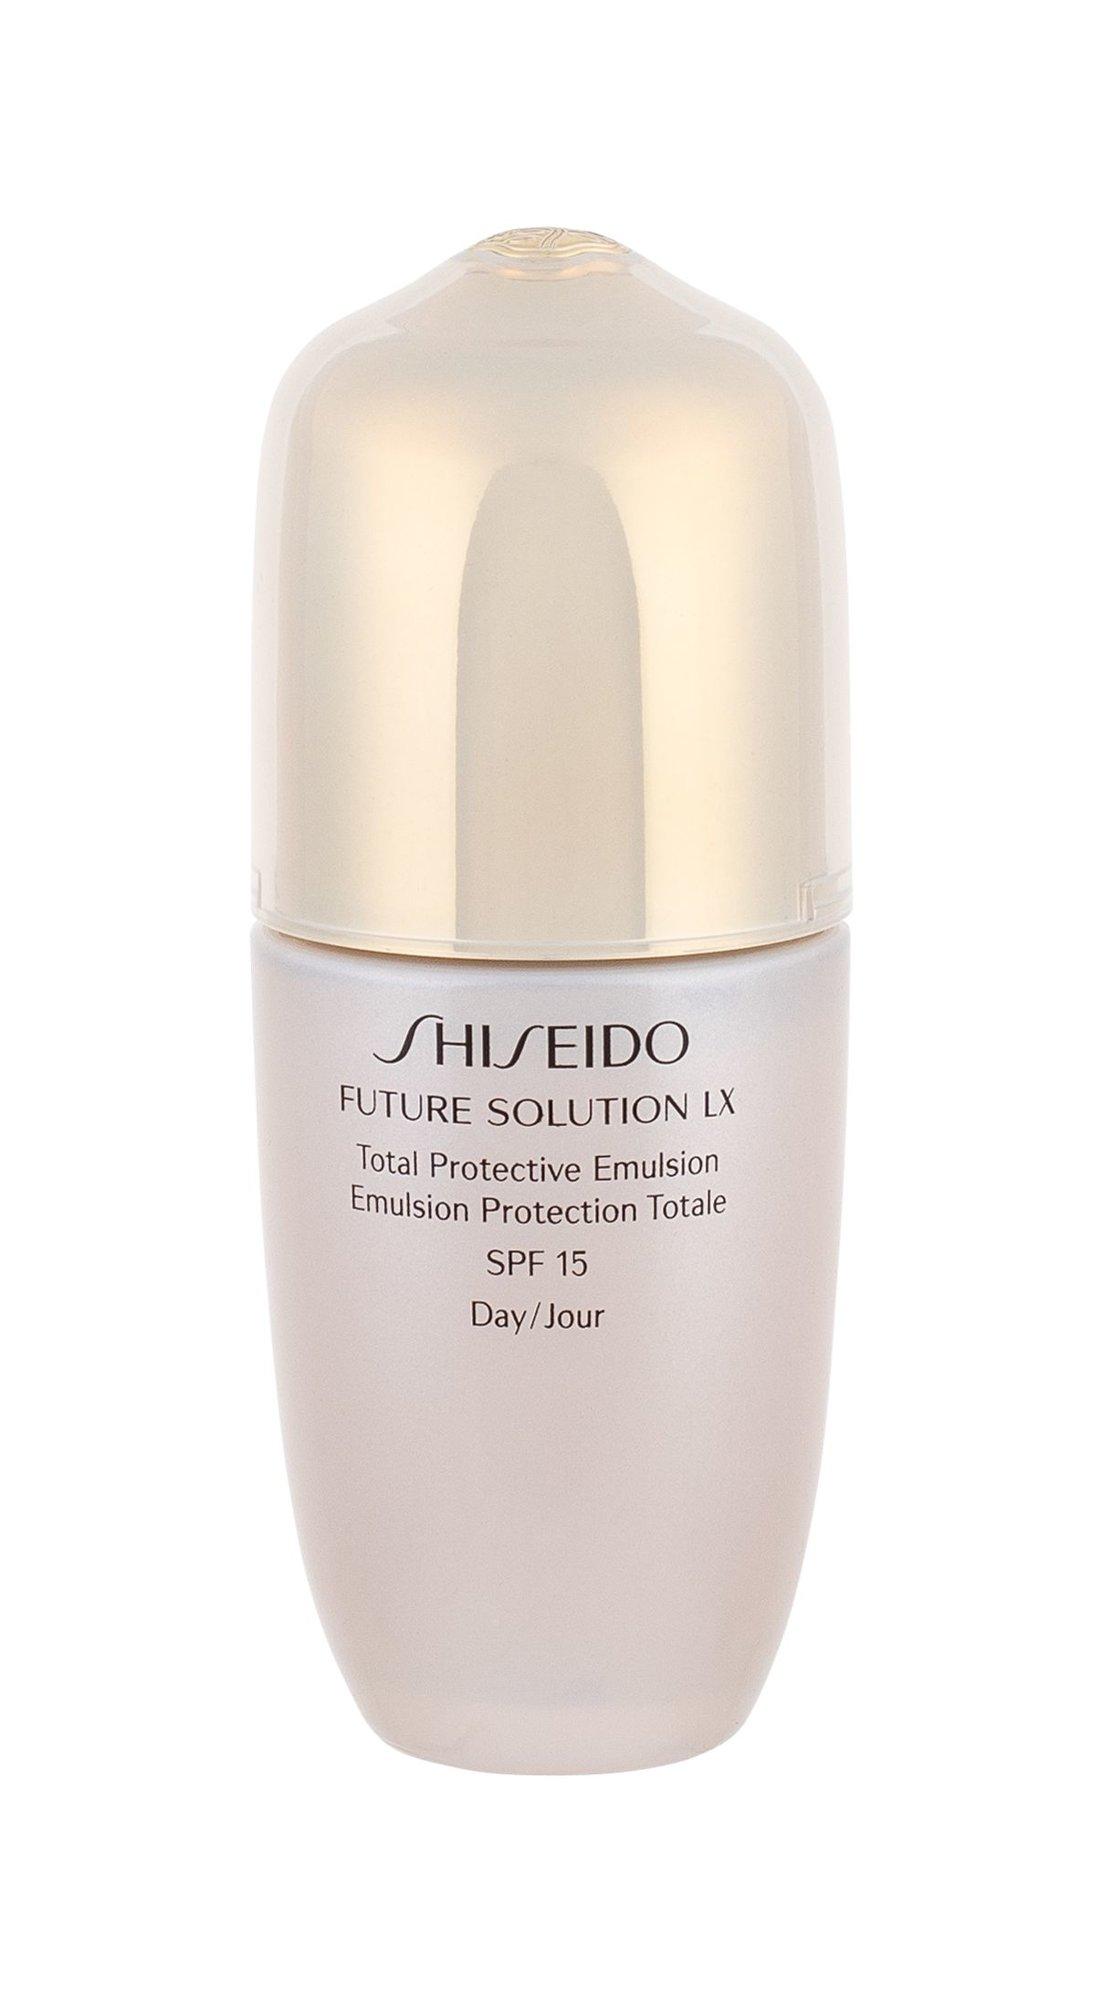 Shiseido Future Solution LX Cosmetic 75ml